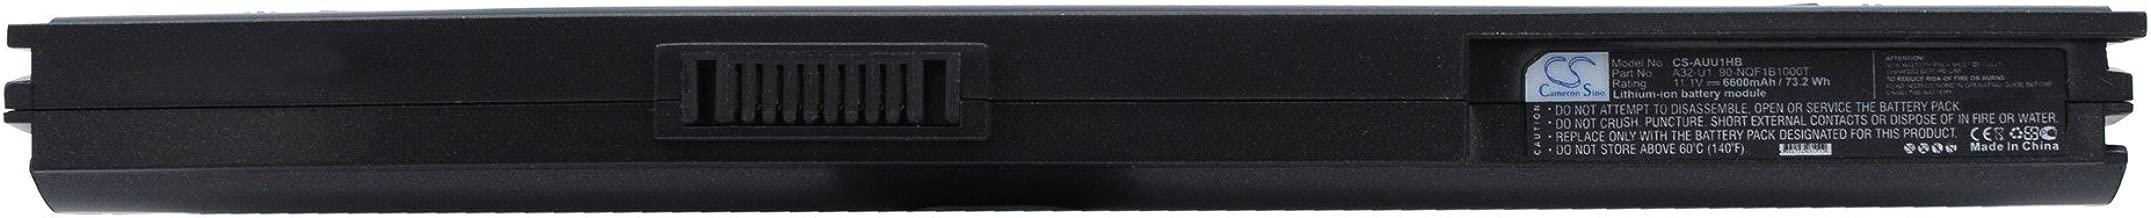 Cameron Sino Replacement Battery Asus Eee PC 1004, Eee PC 1004DN, N10E, N10E-A1, N10J, N10J-A1, N10J-A2, N10Jb, N10Jc, N10JC-A1, N10Jh, U1 (6600mAh)